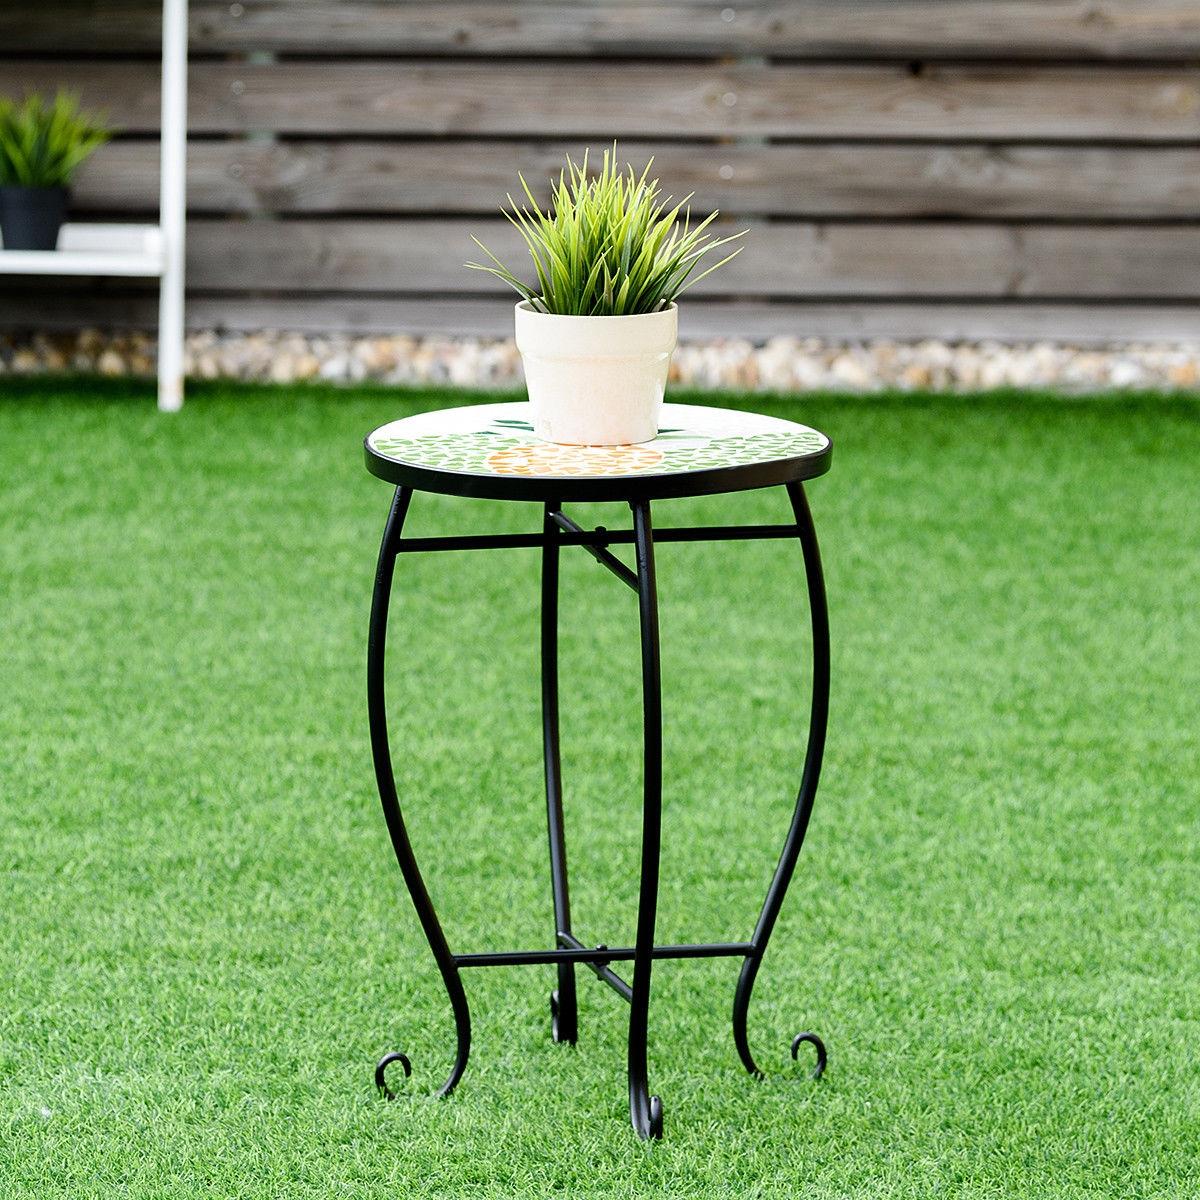 Image of Outdoor Indoor Steel Accent Plant Stand Cobalt Table